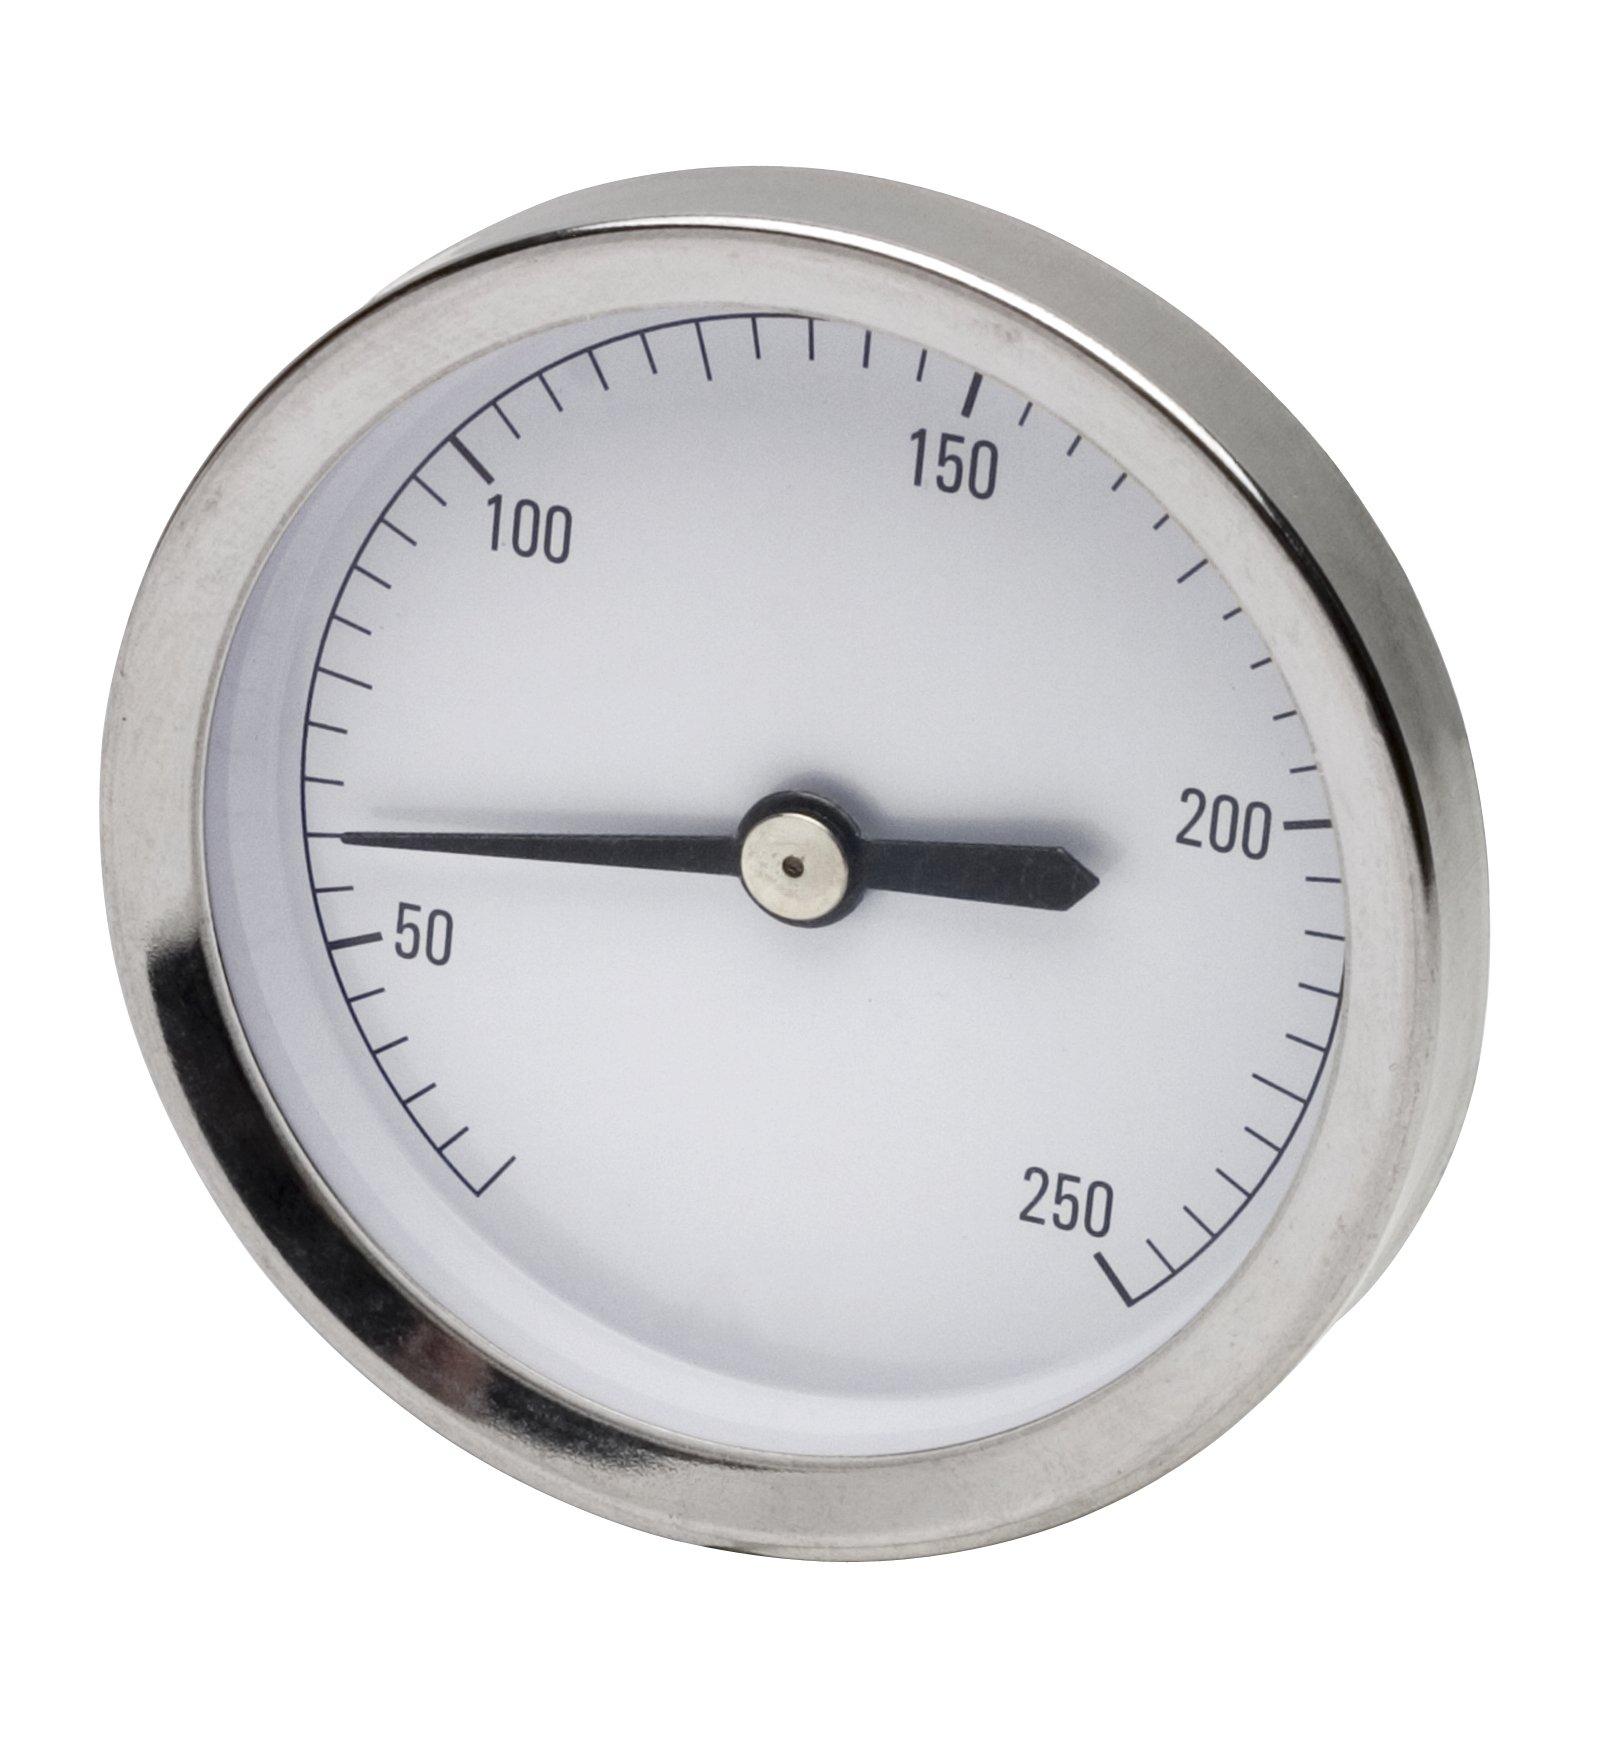 H-B DURAC Bi-Metallic Surface Temperature Thermometer; 25/250F, 64mm Dial, Single Thin Spring (B61320-1700)